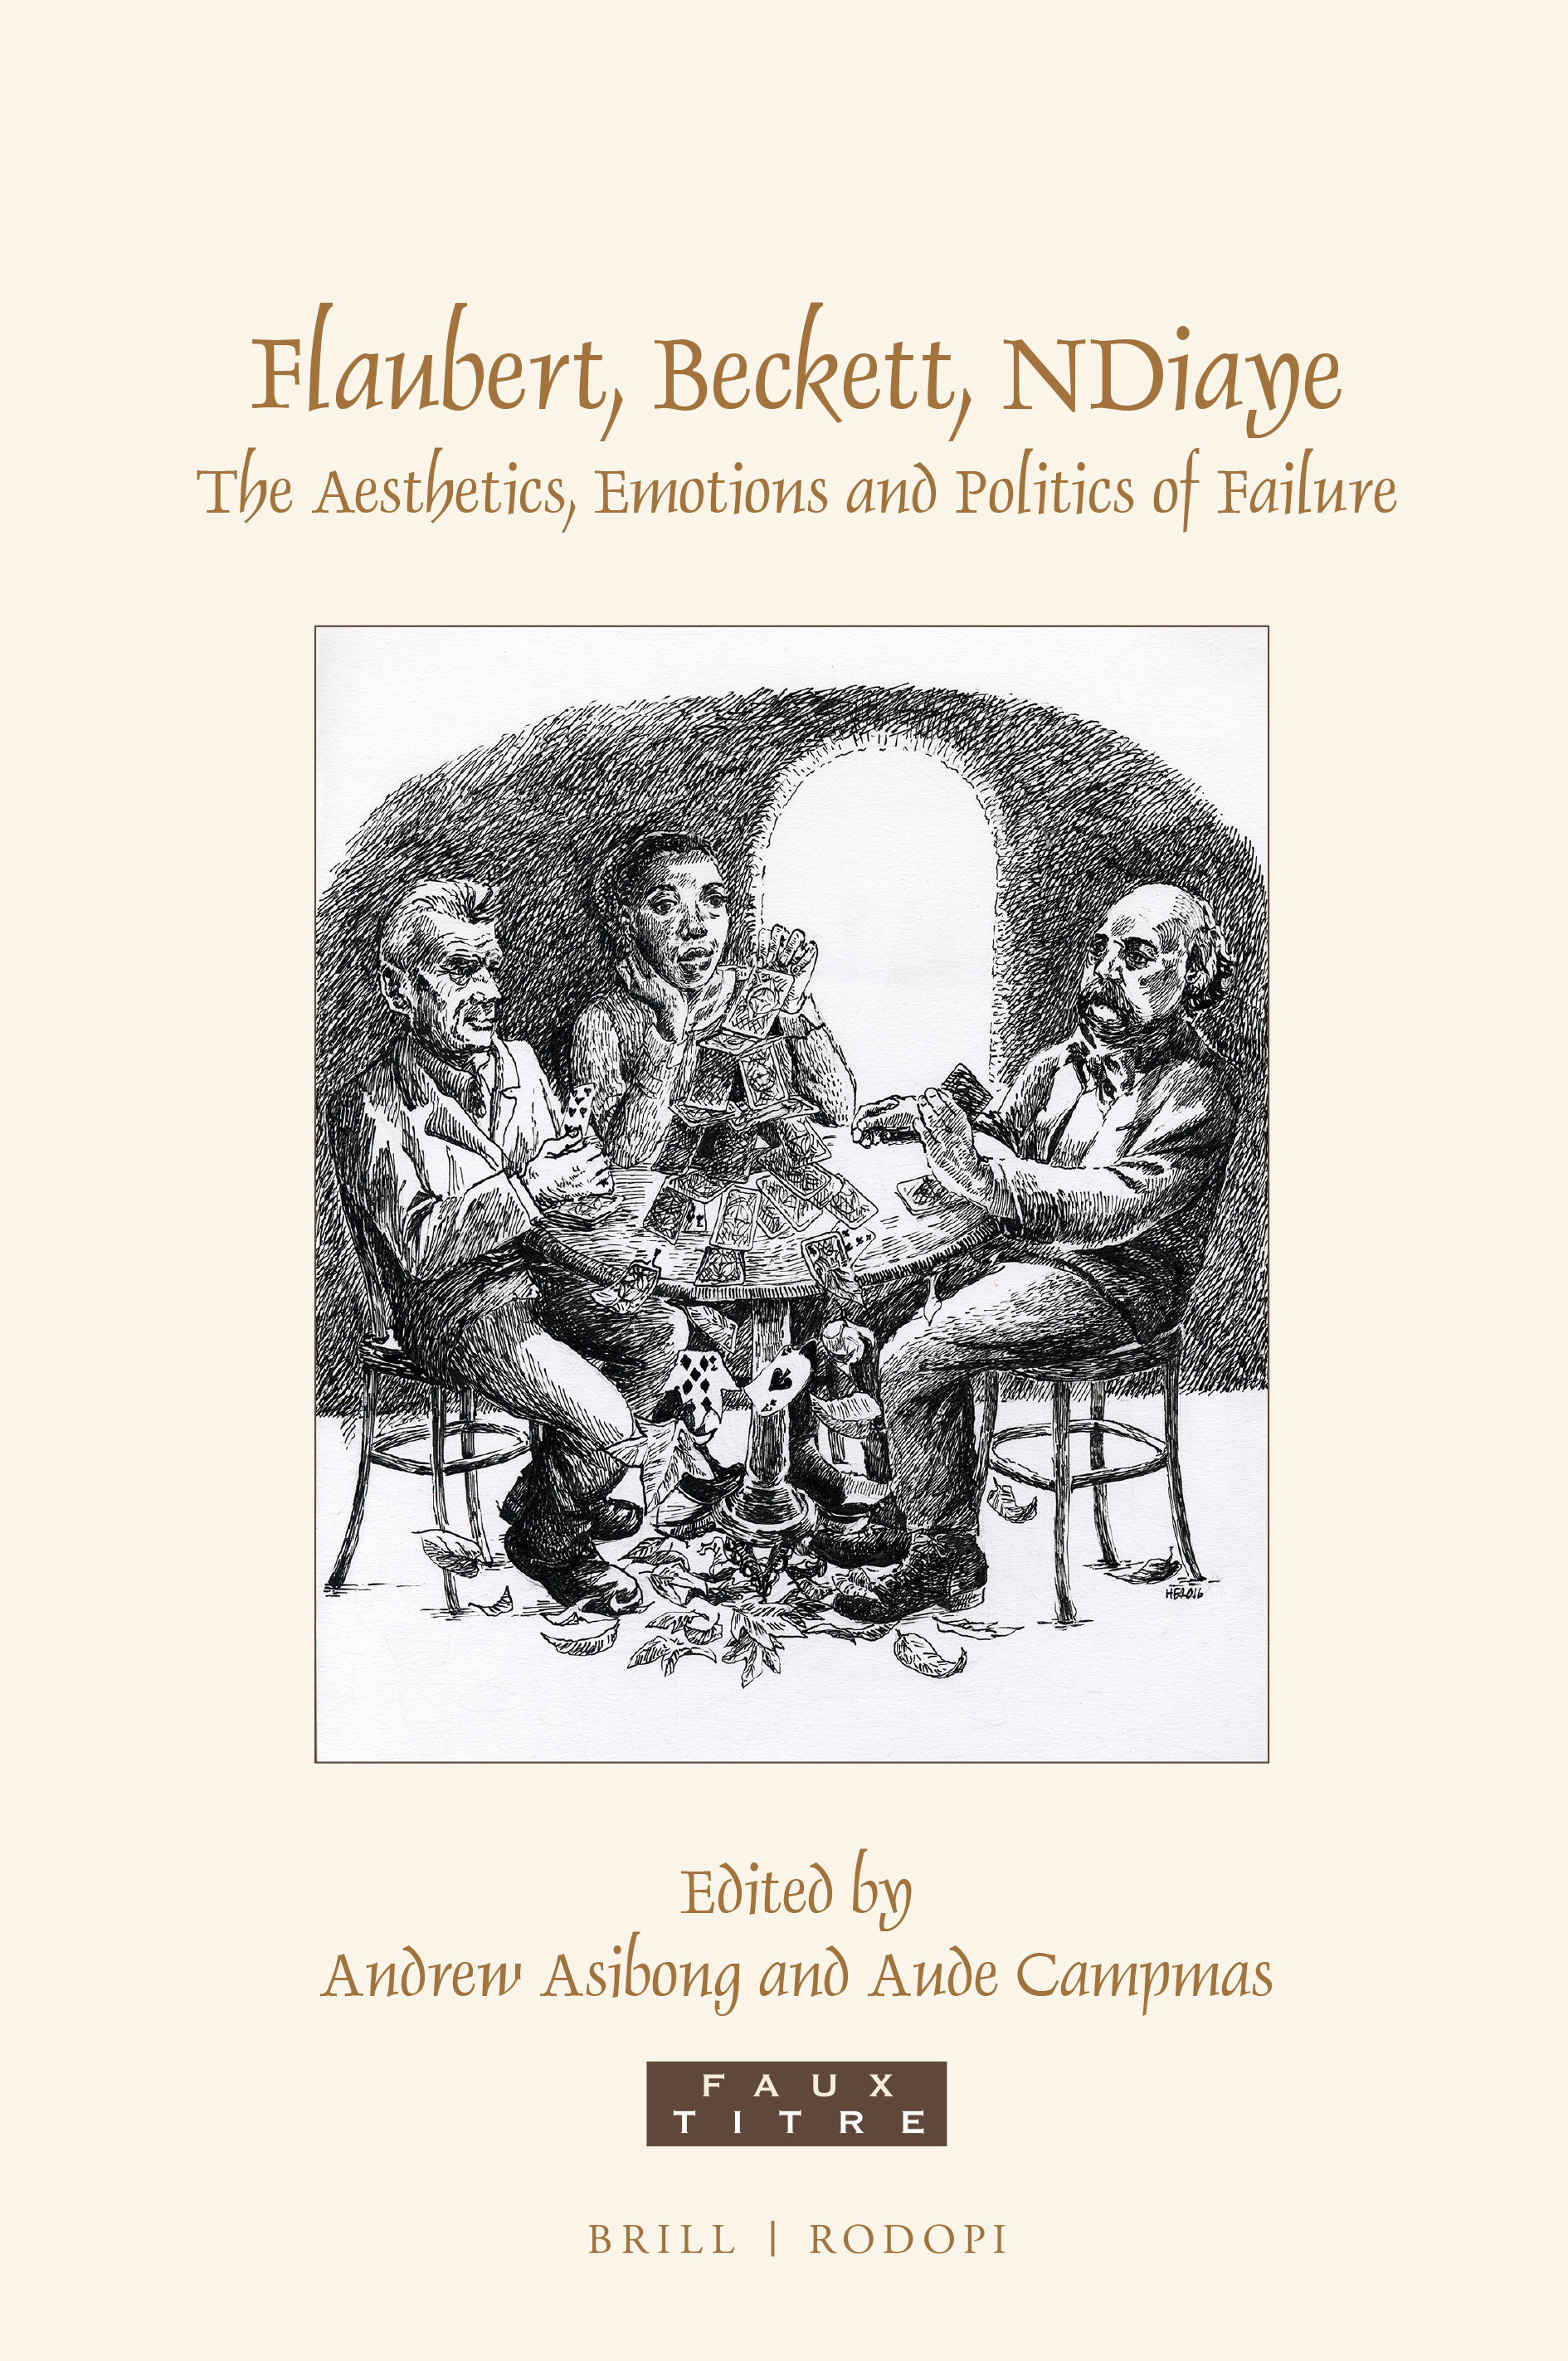 A. Asibong, A. Campmas (eds), Flaubert, Beckett, NDiaye. The Aesthetics, Emotions and Politics of Failure